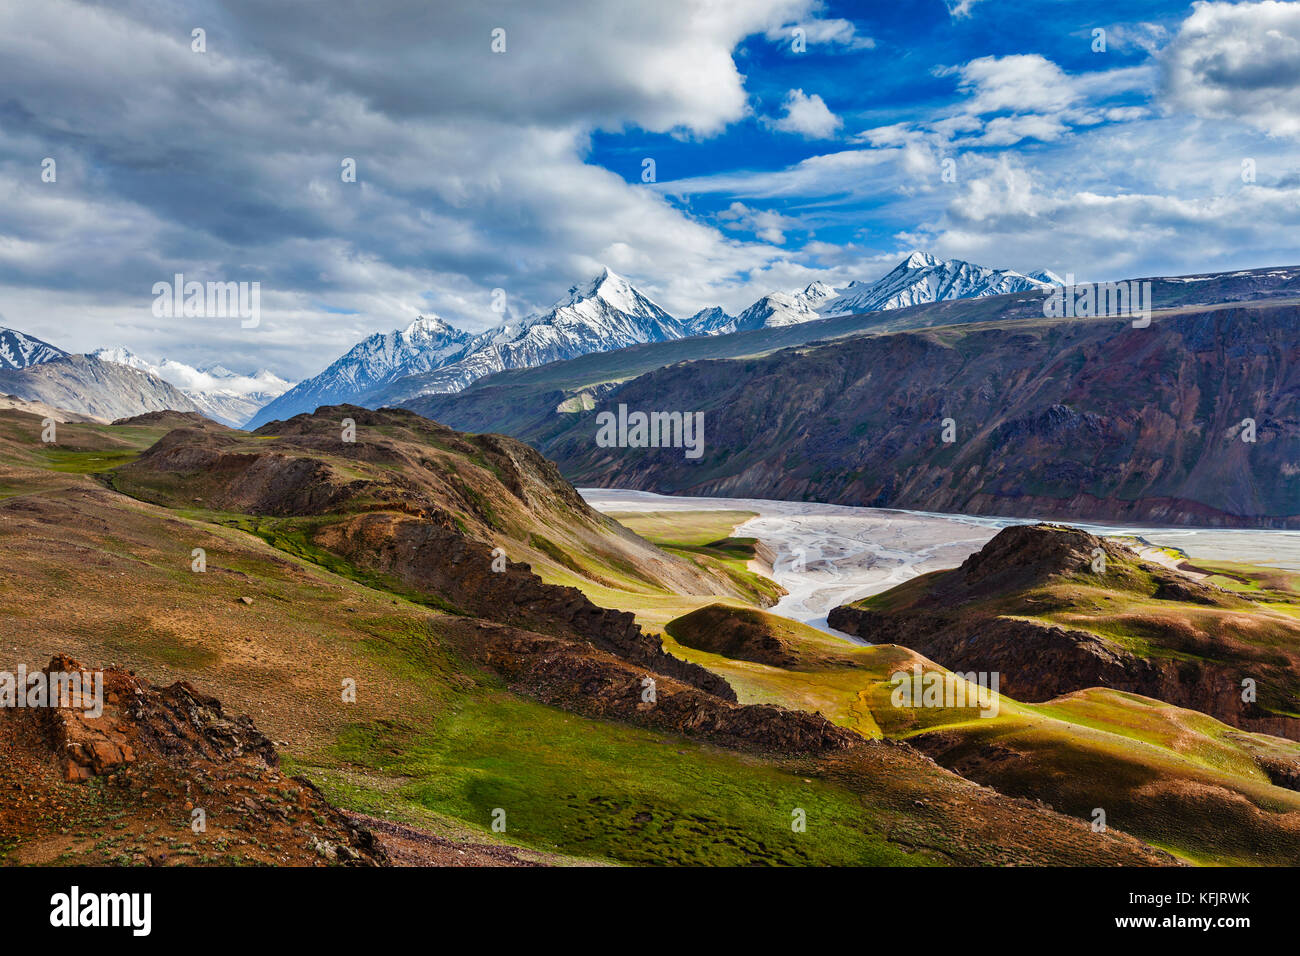 HImalayan landscape in Himalayas, Himachal Pradesh, India - Stock Image